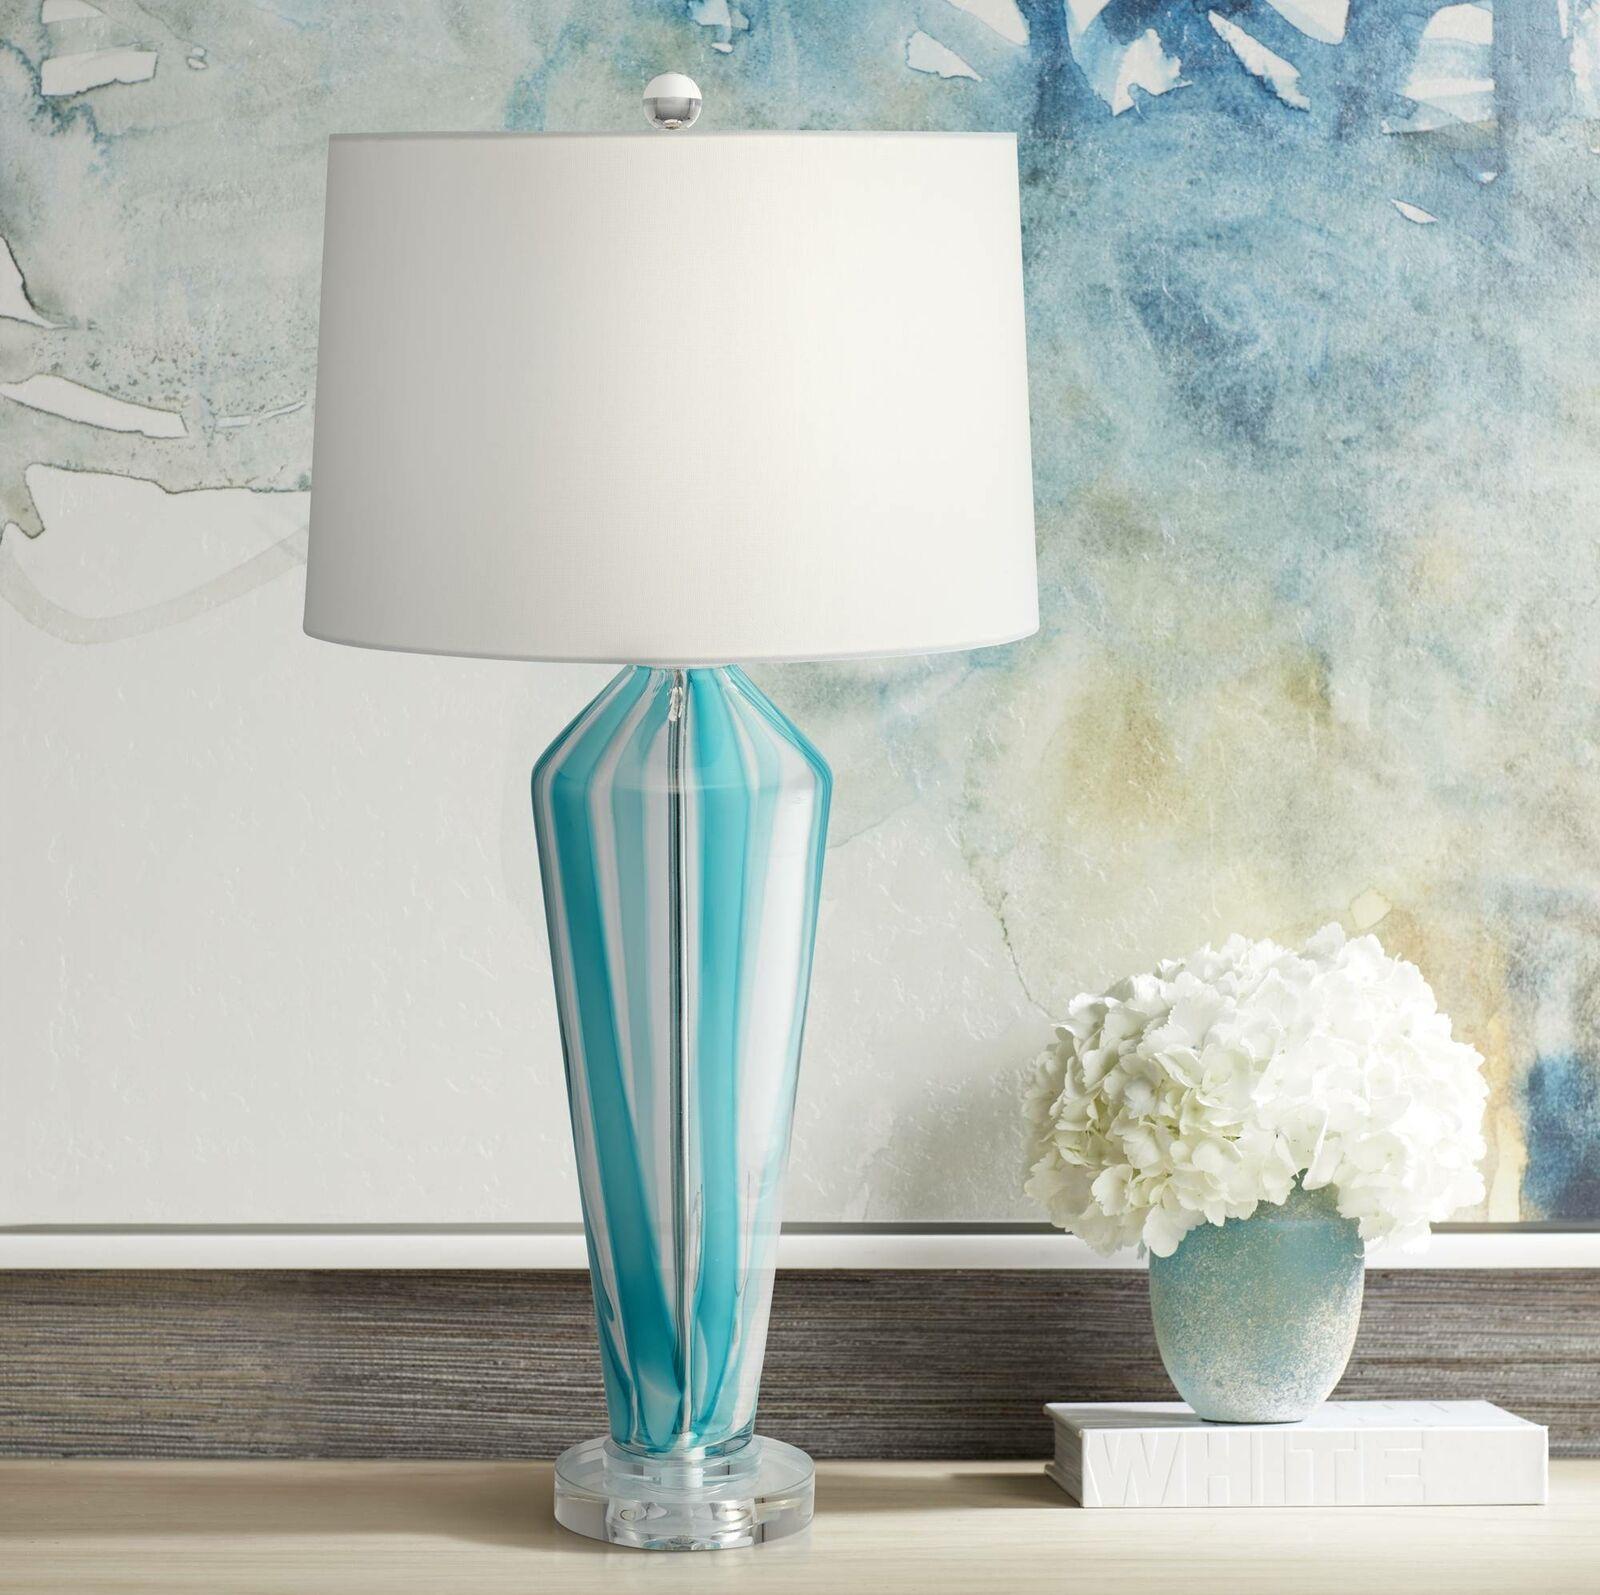 Modern Table Lamp Blue Art Glass White Drum Shade Living Room Bedroom Bedside For Sale Online